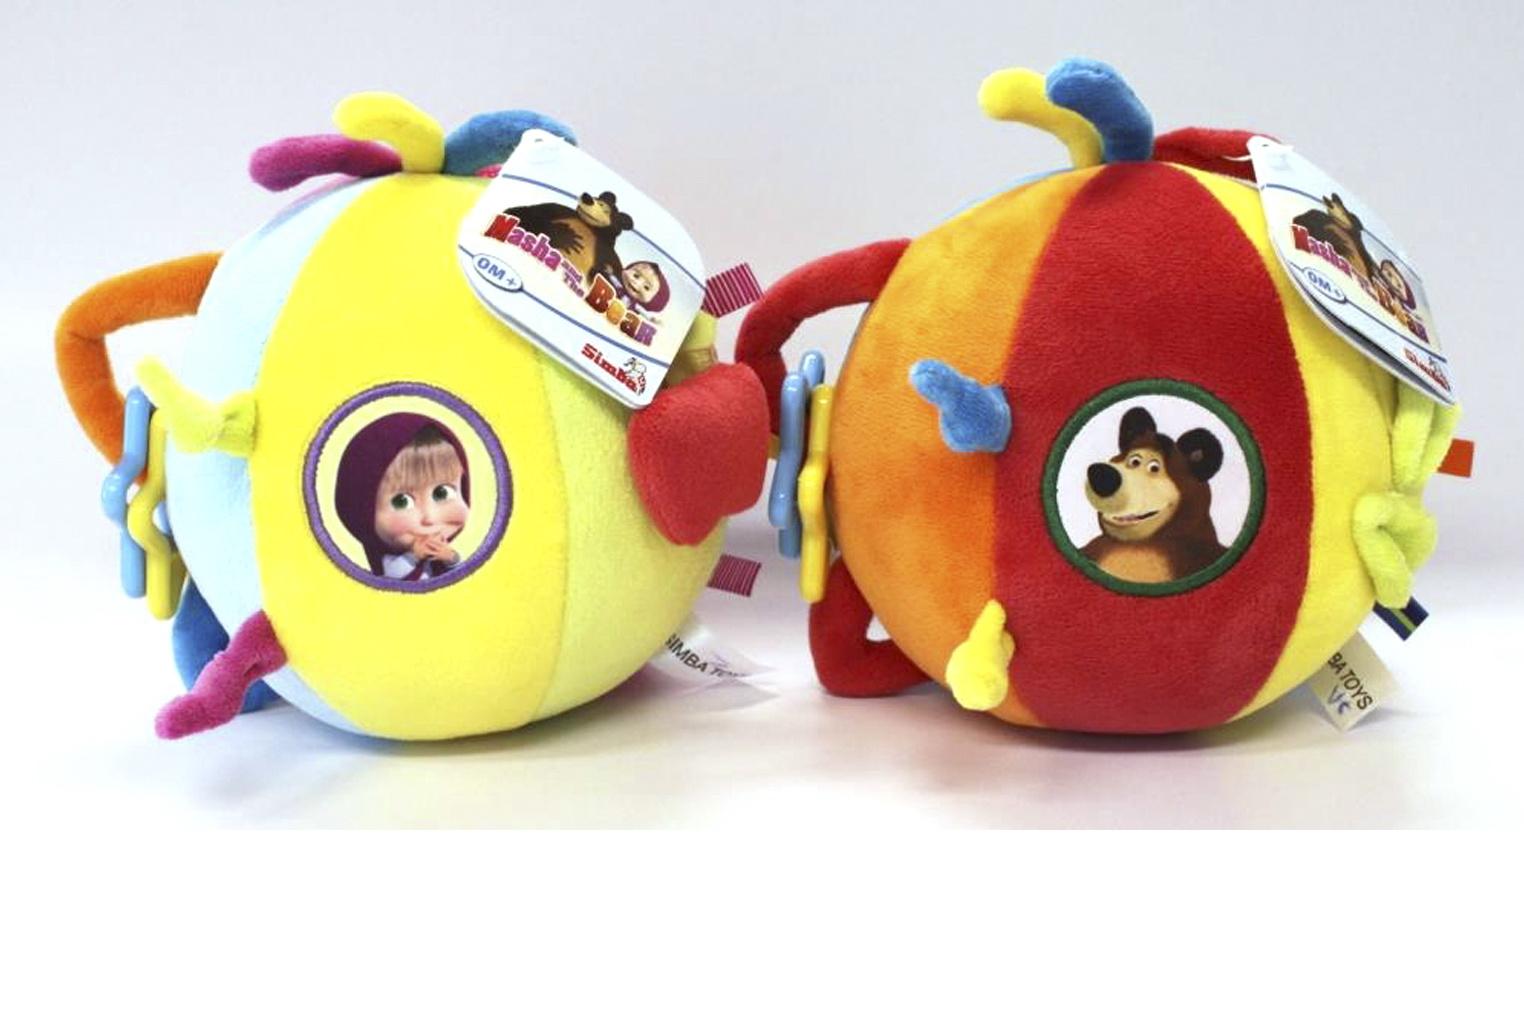 Плюшевый шар-погремушка «Маша и Медведь», 2 вида - Скидки до 70%, артикул: 137730